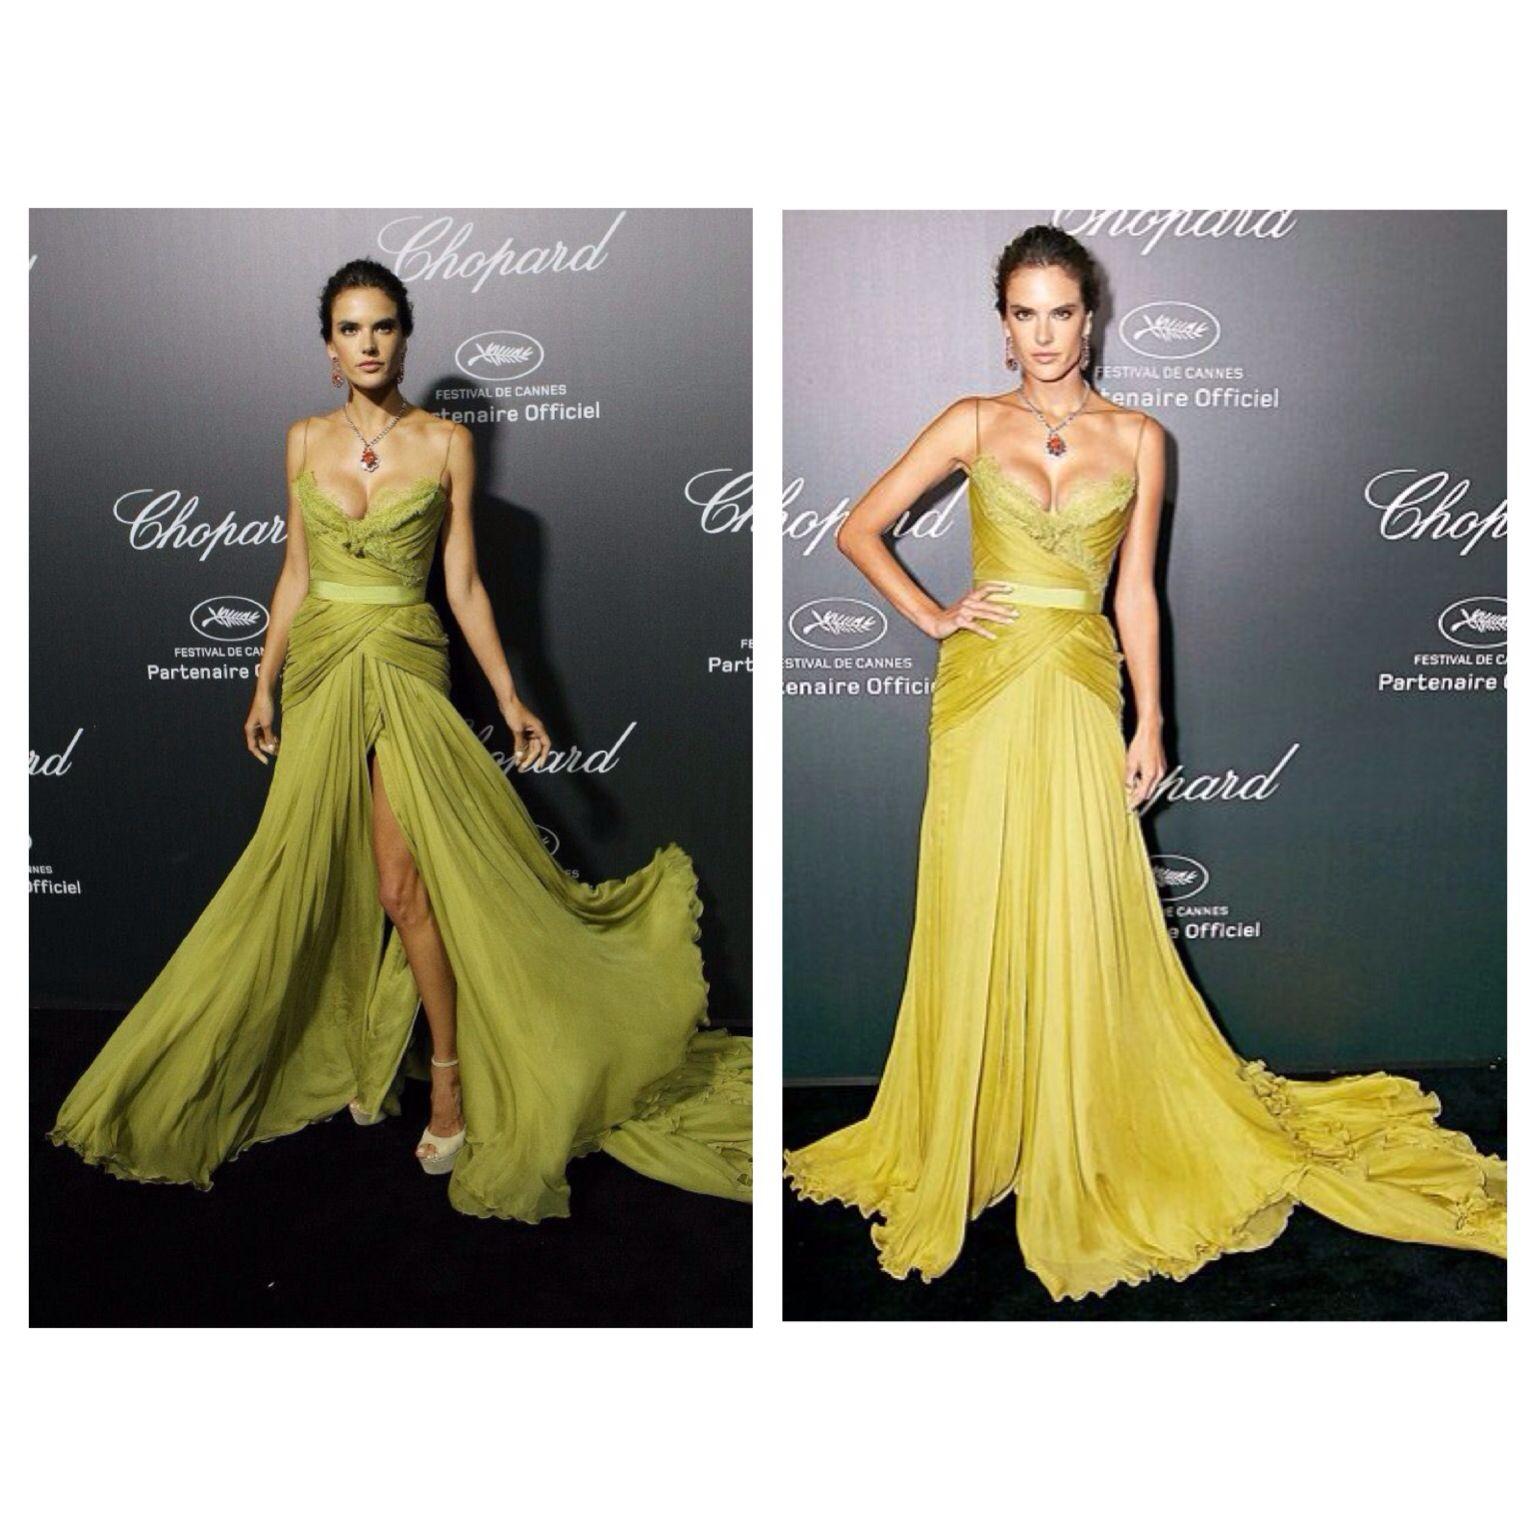 Alessandra Ambrosio in a green dress